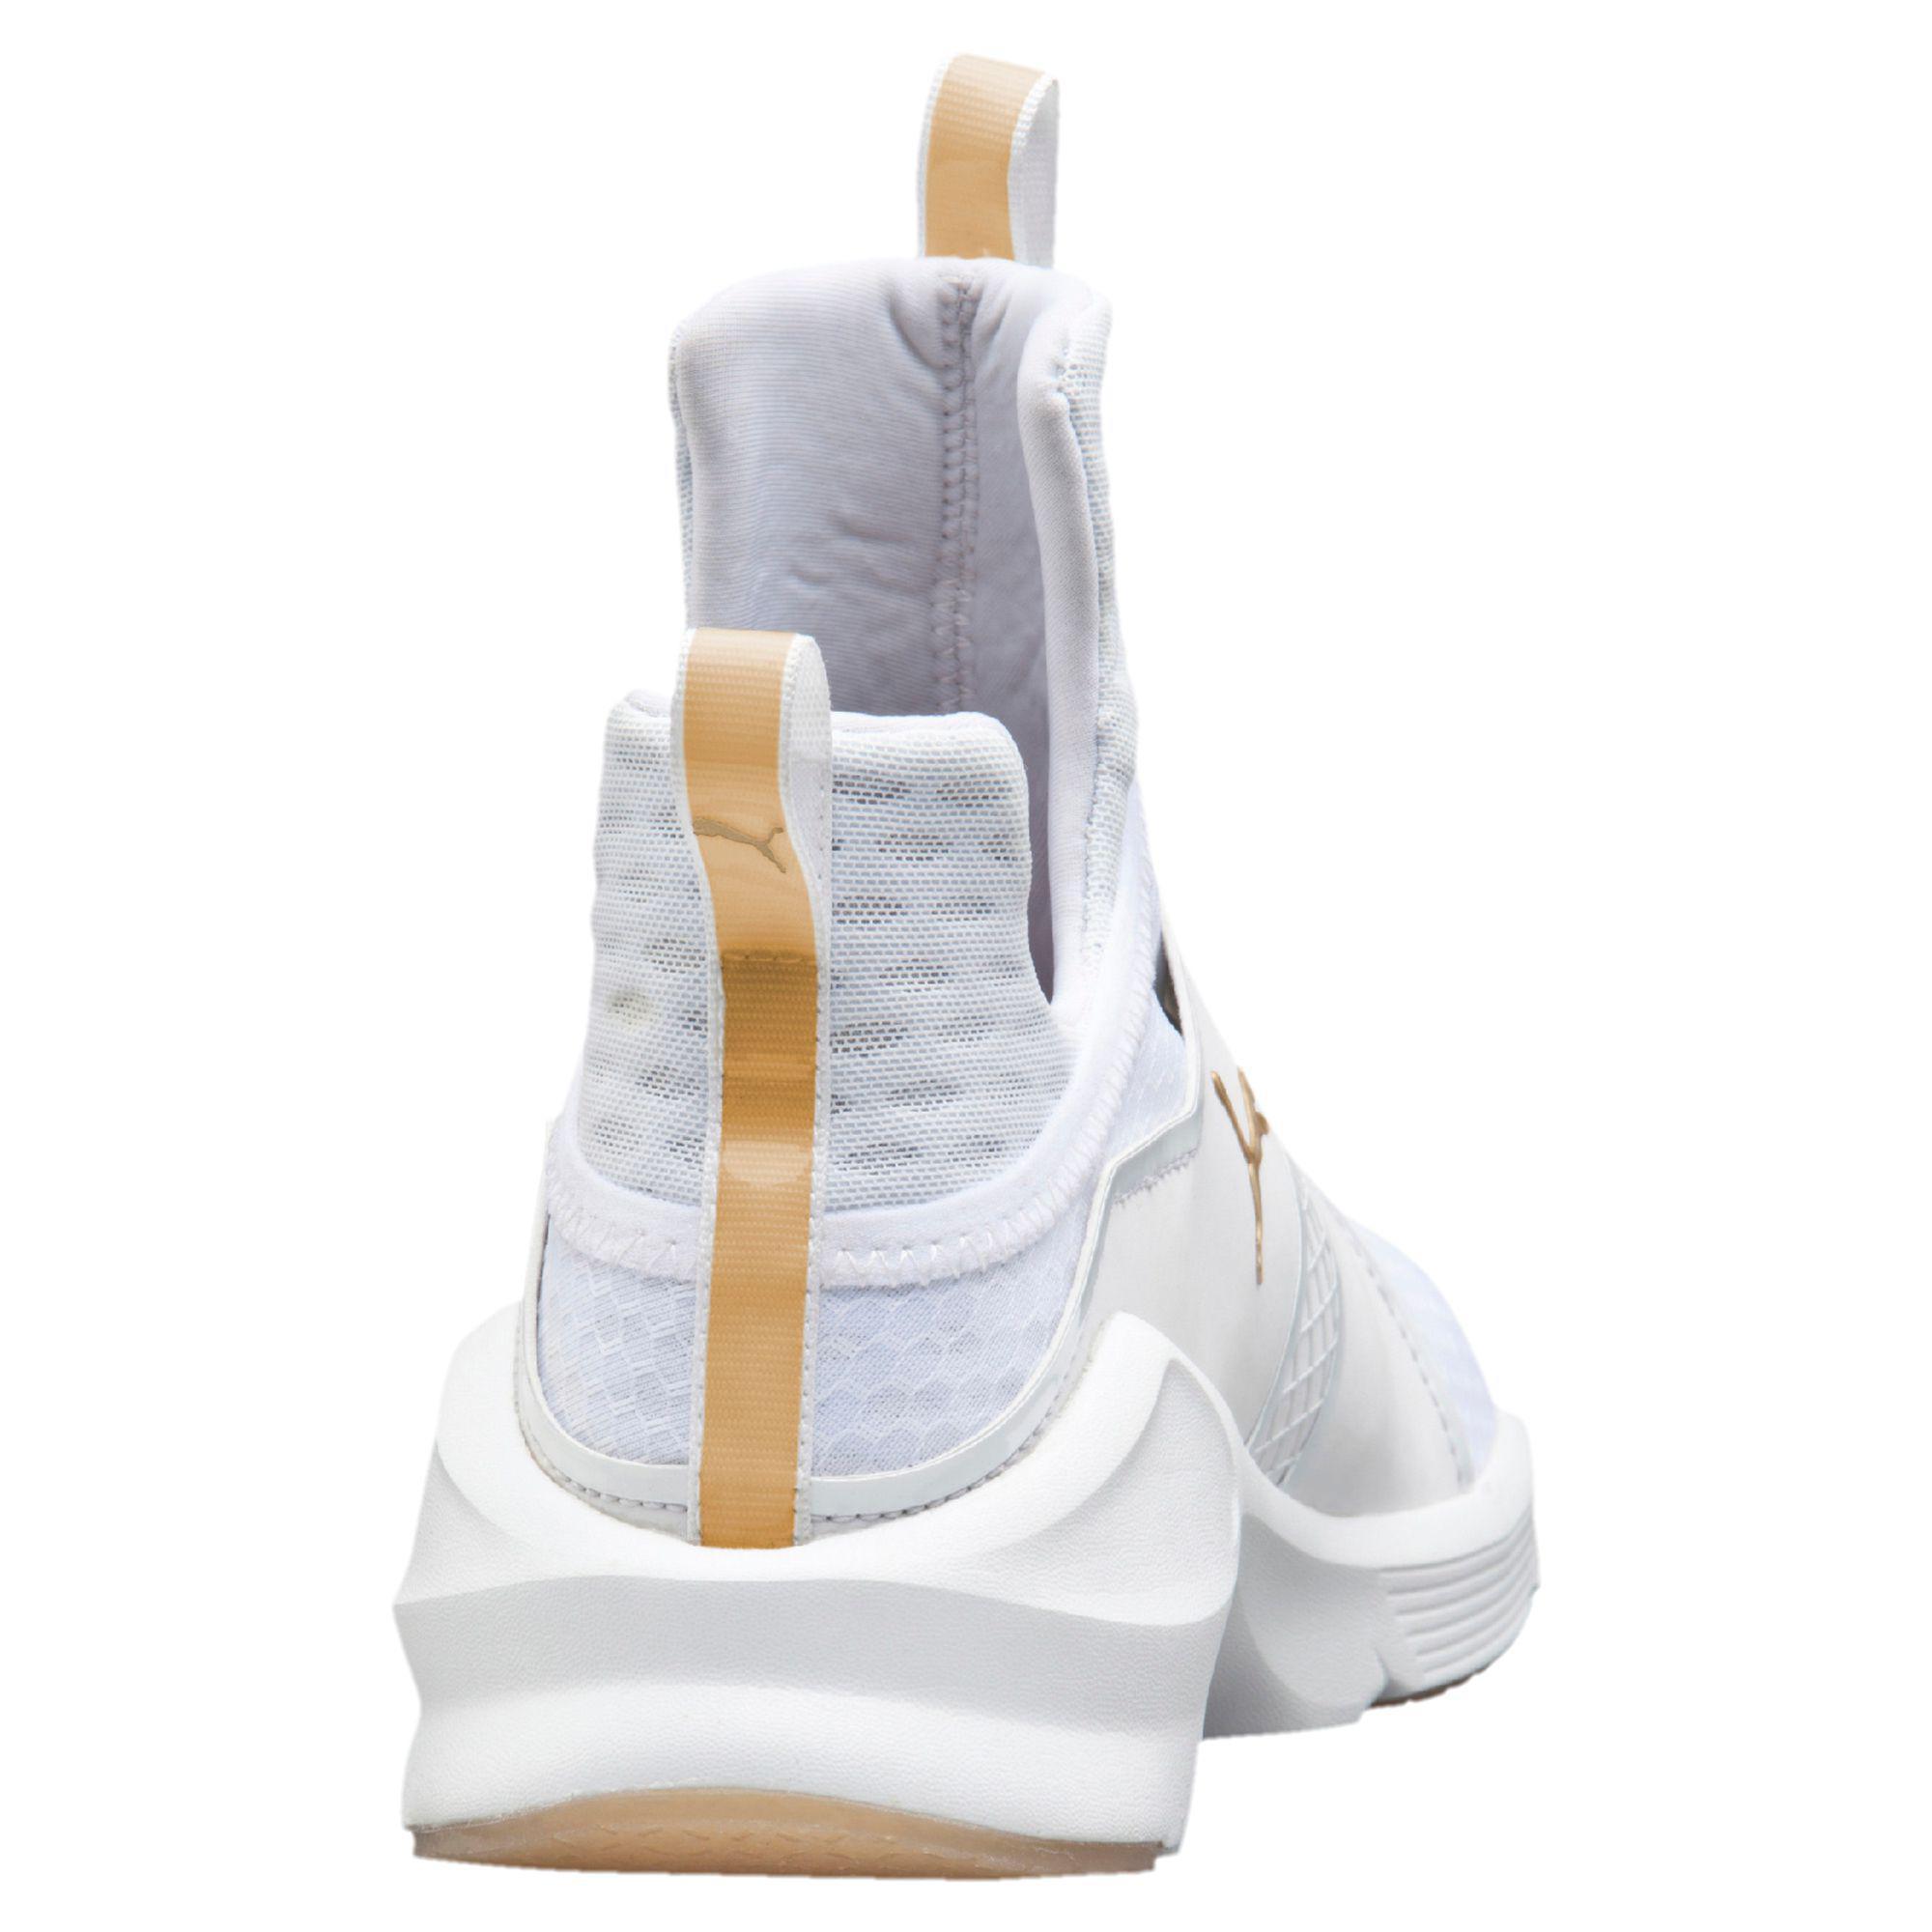 2acdb0c98c6a Fierce Fierce Fierce Gold Puma Shoes Training Lyst Women s qUxRw5gC6g